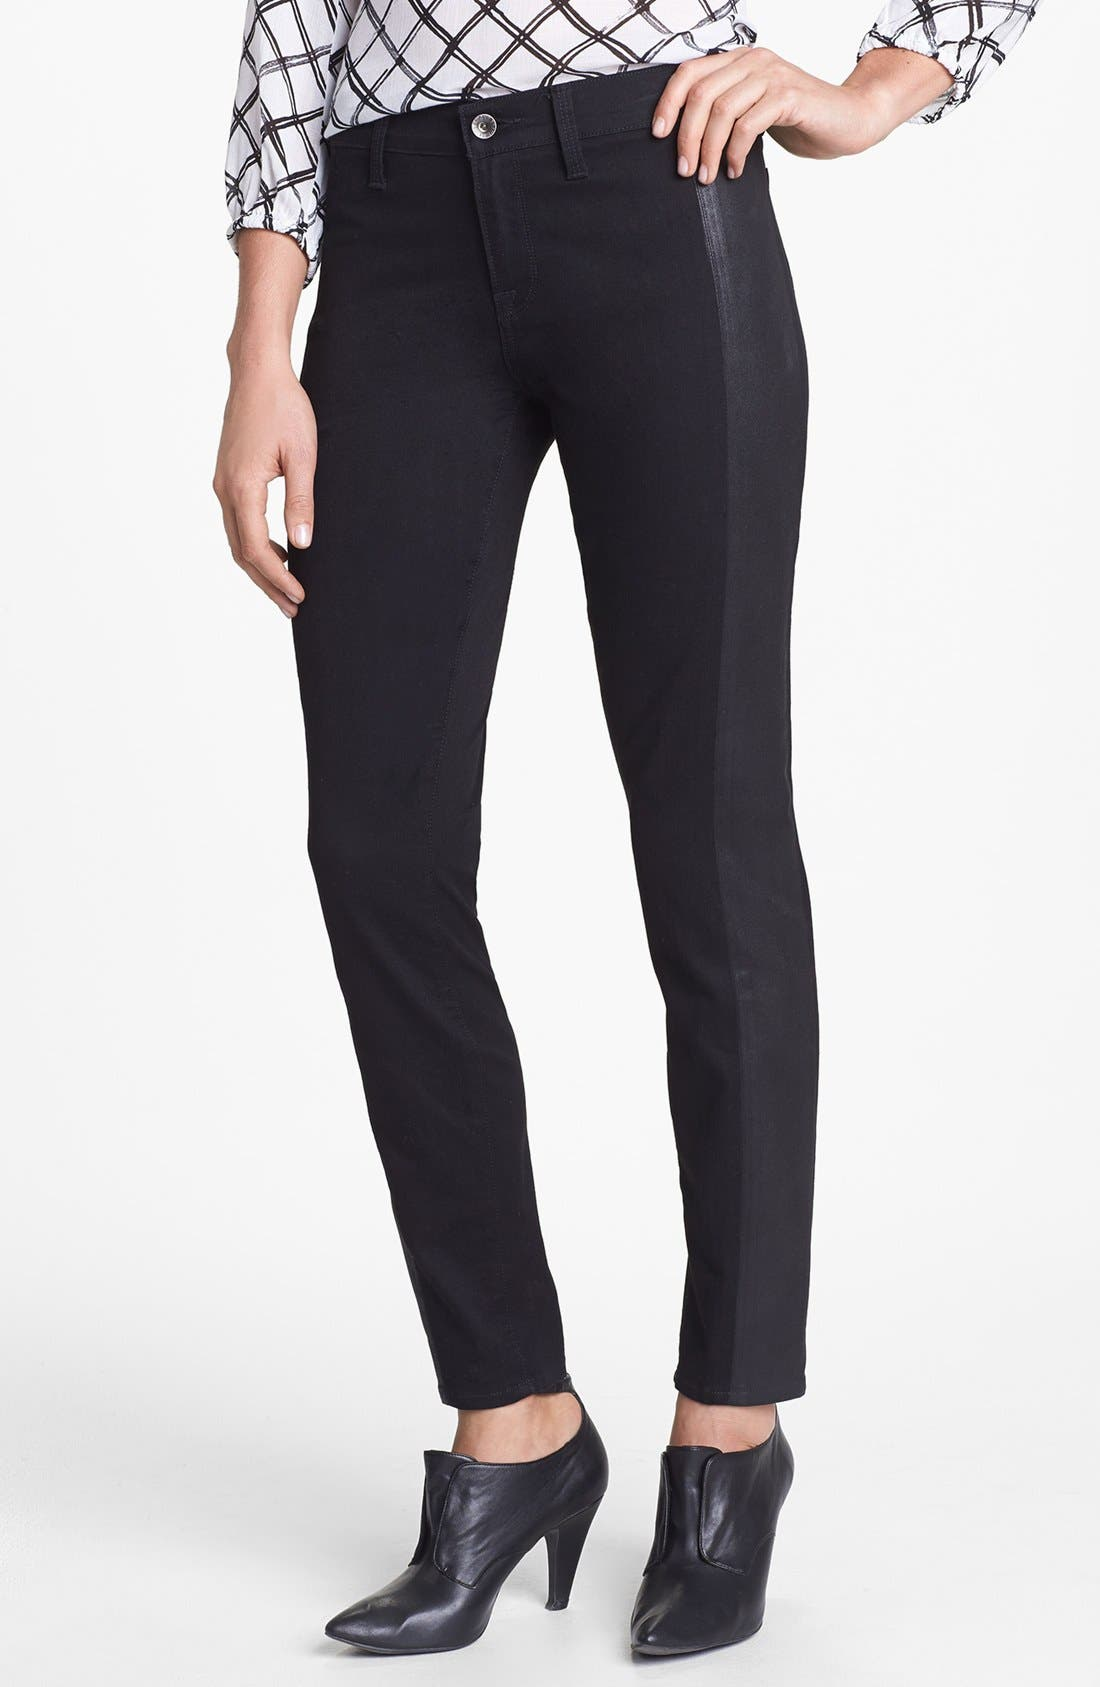 Main Image - Lucky Brand 'Sofia' Tuxedo Detail Skinny Jeans (Jededia)